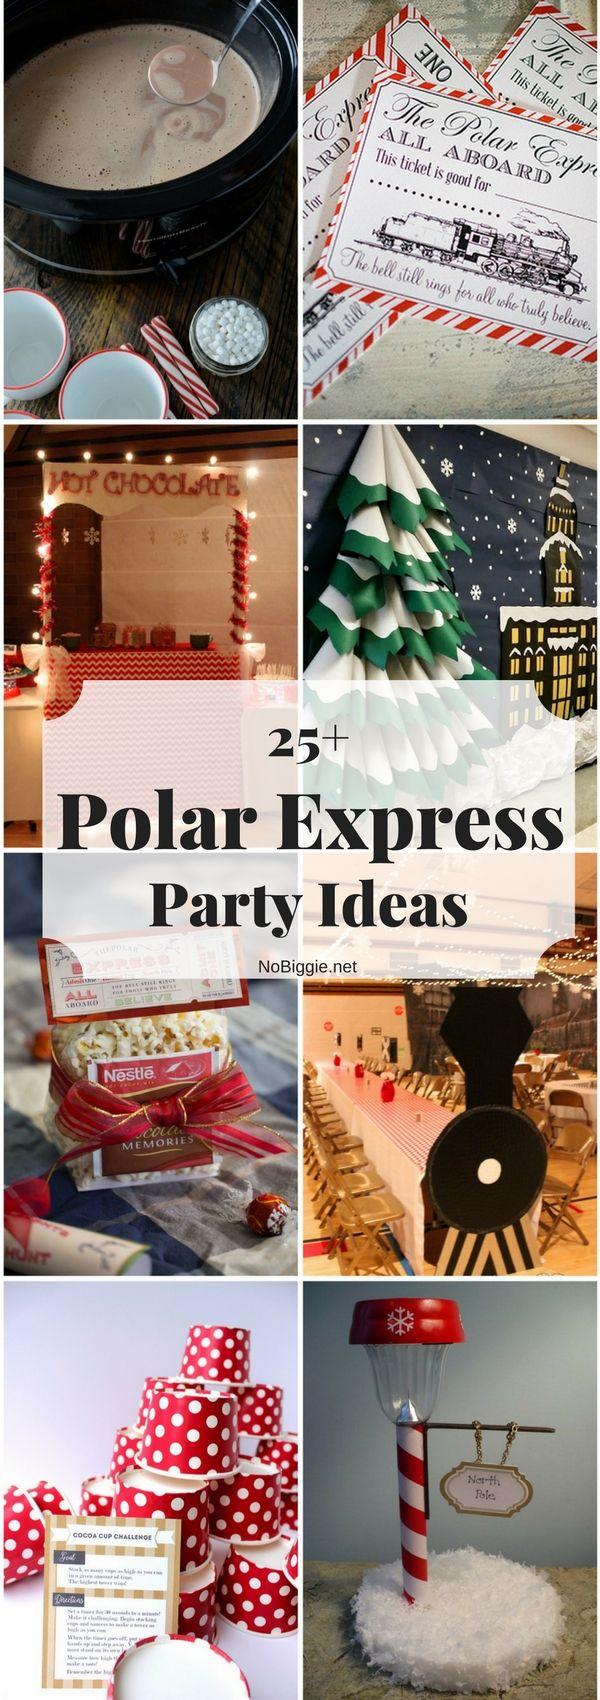 Funny Christmas Theme Party Ideas Part - 24: 25+ Polar Express Party Ideas | NoBiggie.net